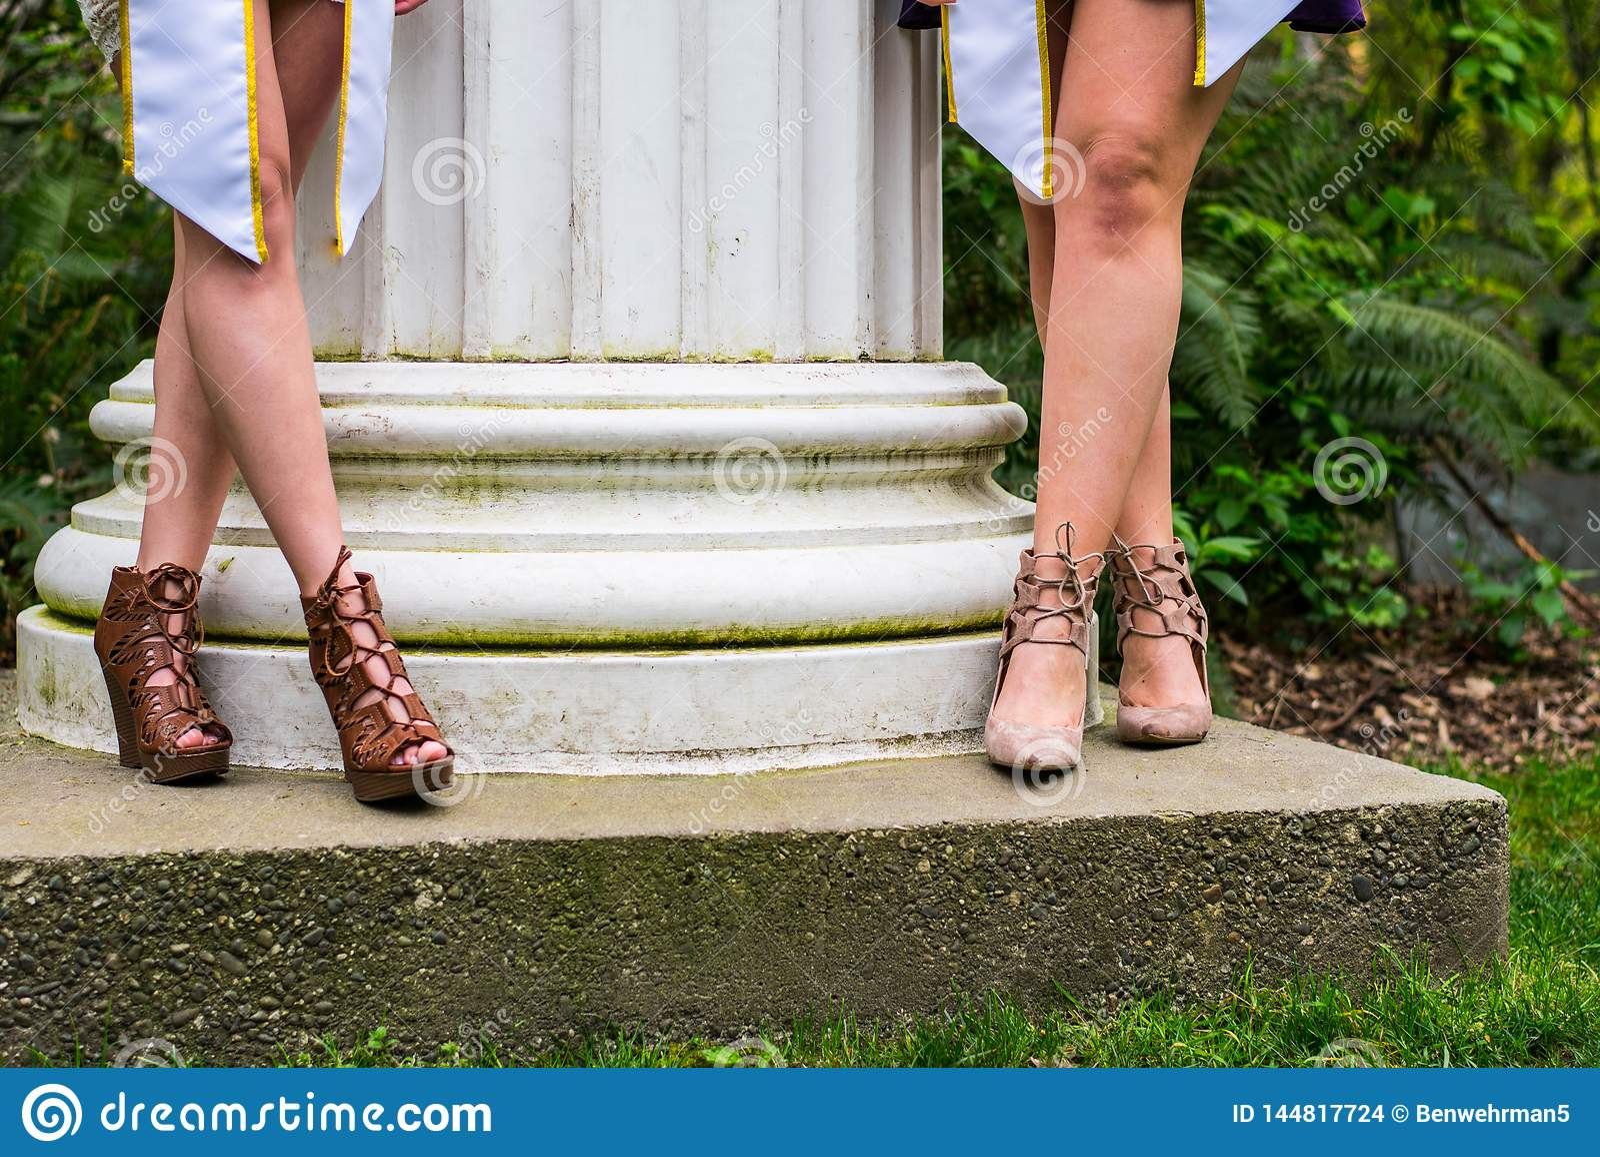 Sorority Girls Graduating